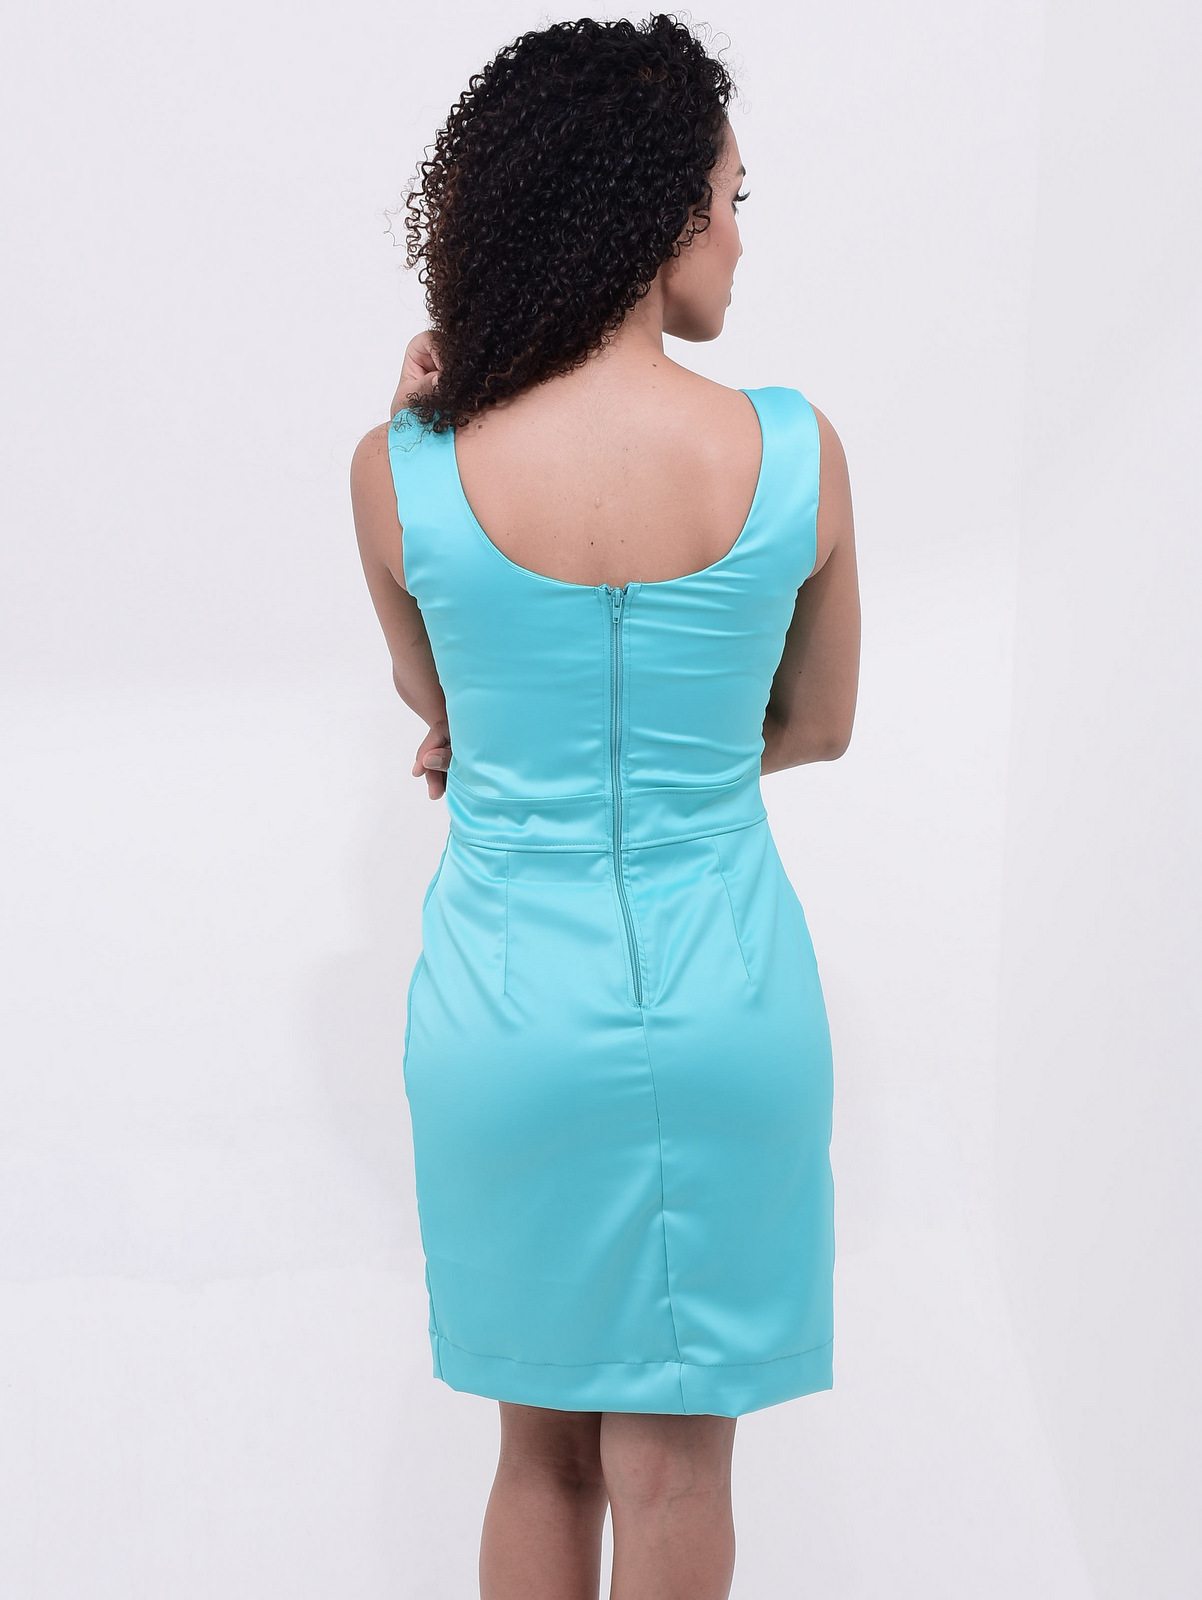 vestido azul turquesa